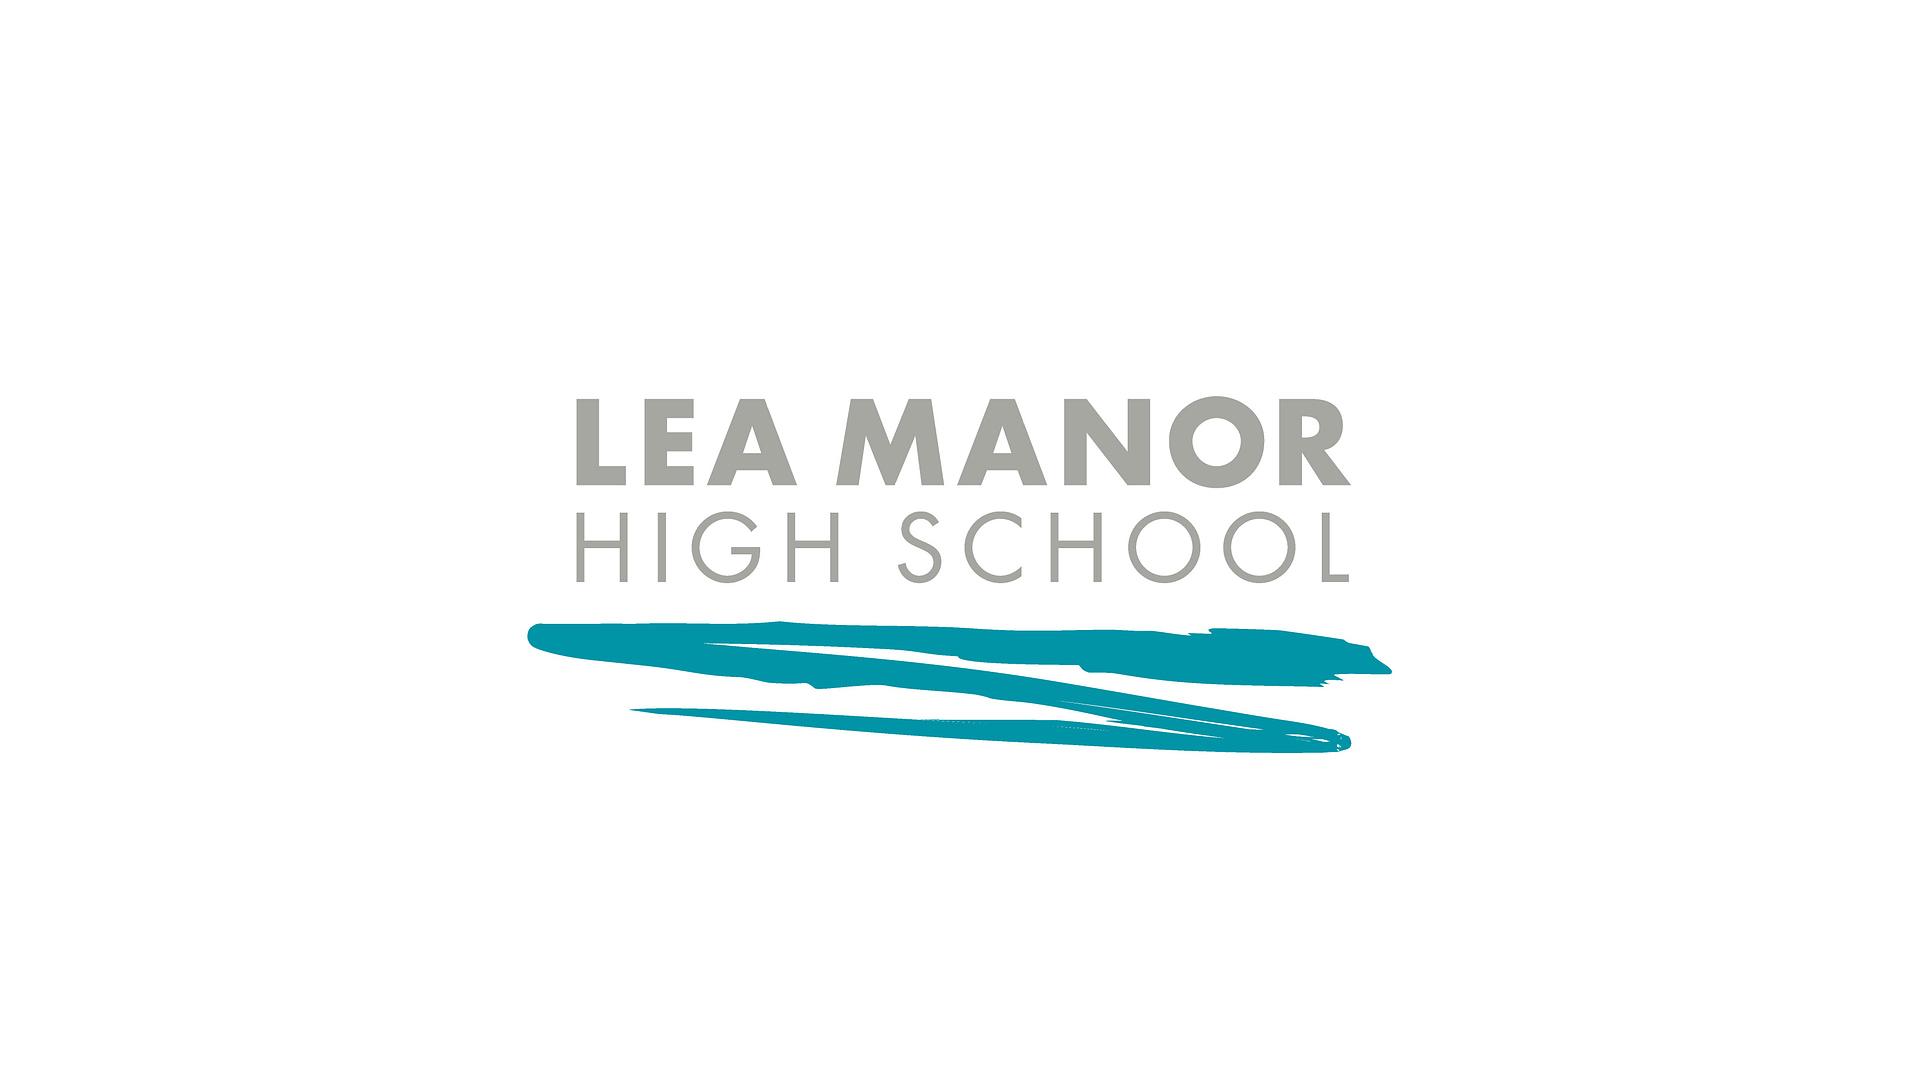 Lea Manor High School logo